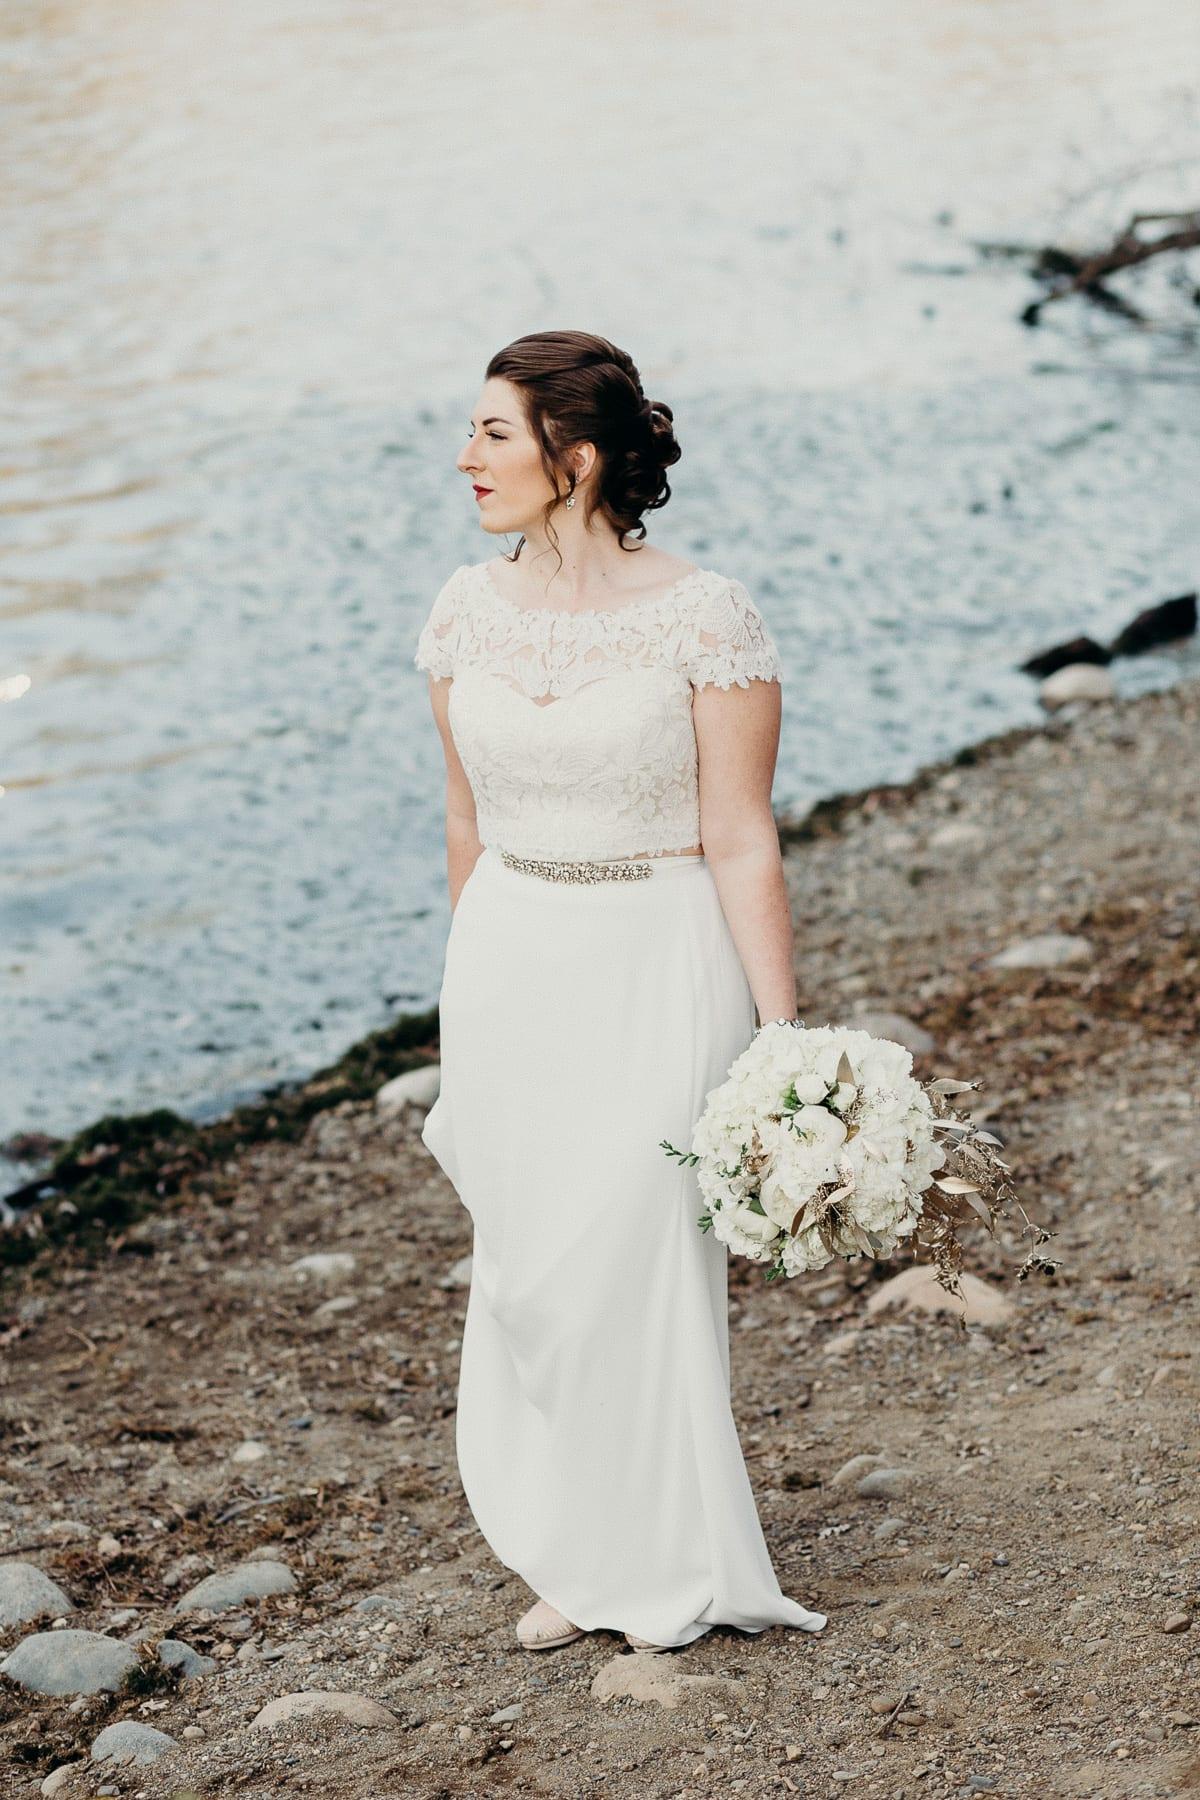 Wedding Dresses In Redding California - bestweddingdresses